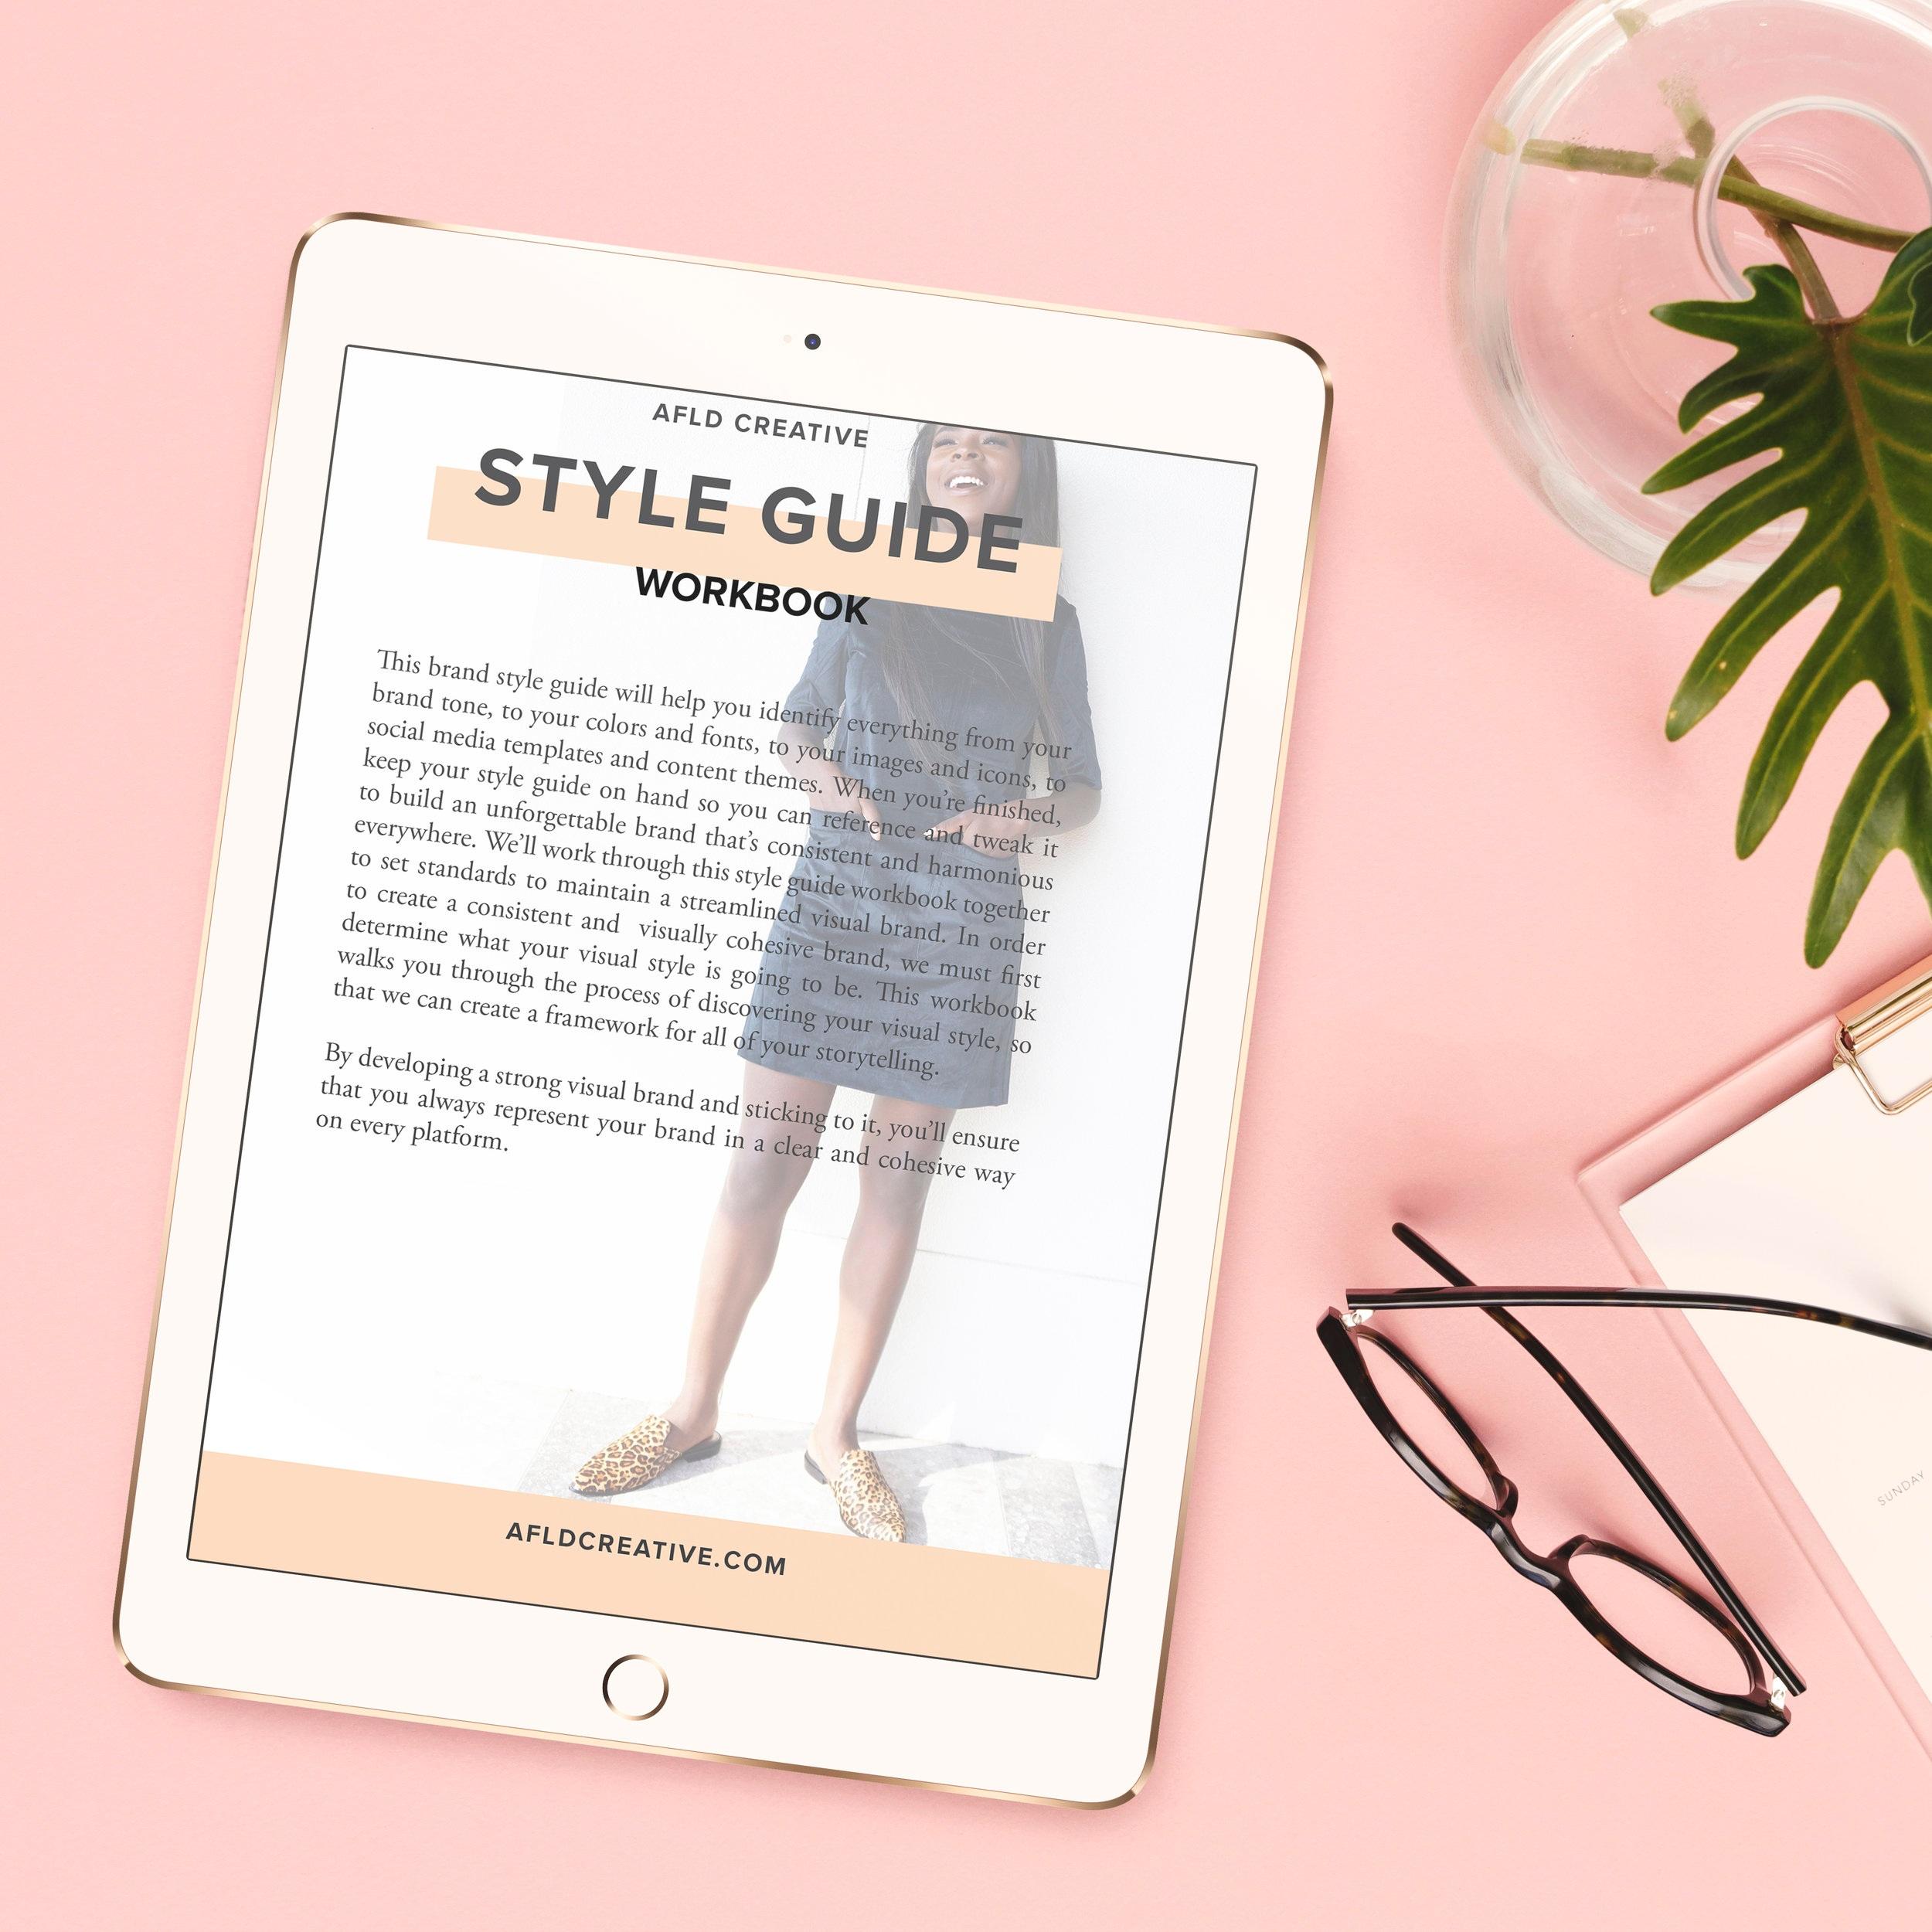 AFLD Creative Studio Brand Style Guide Workbook